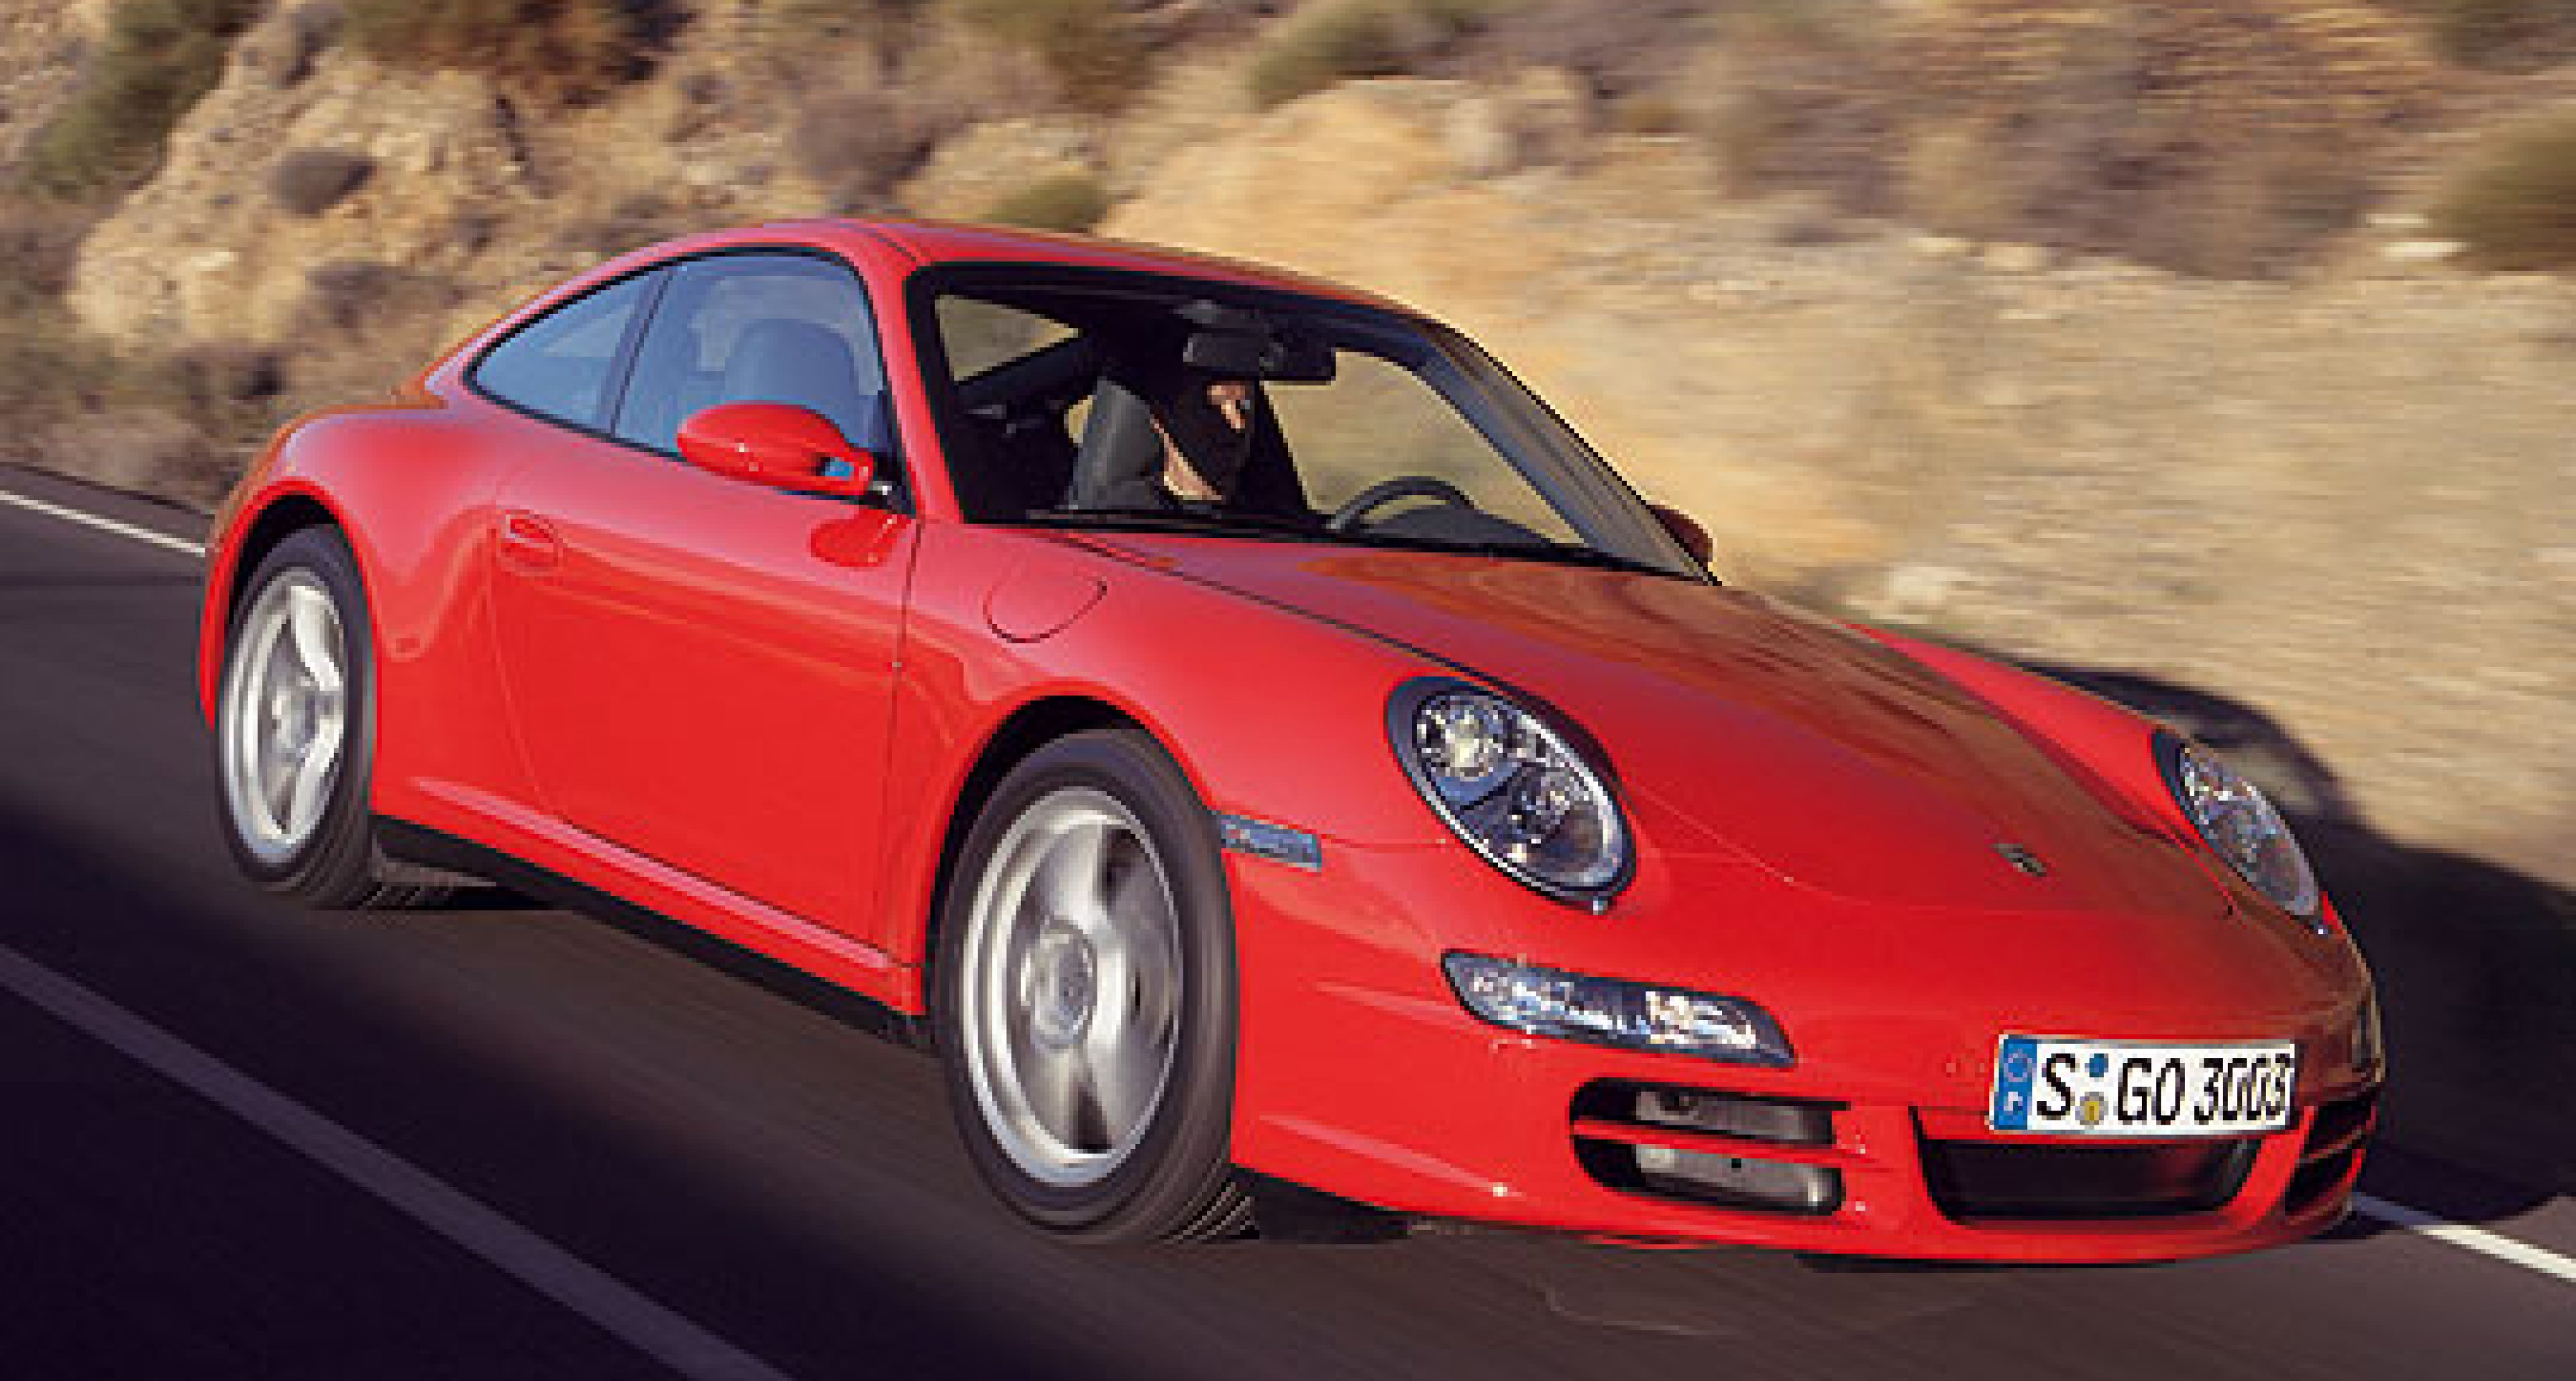 New 4wd versions of Porsche 911